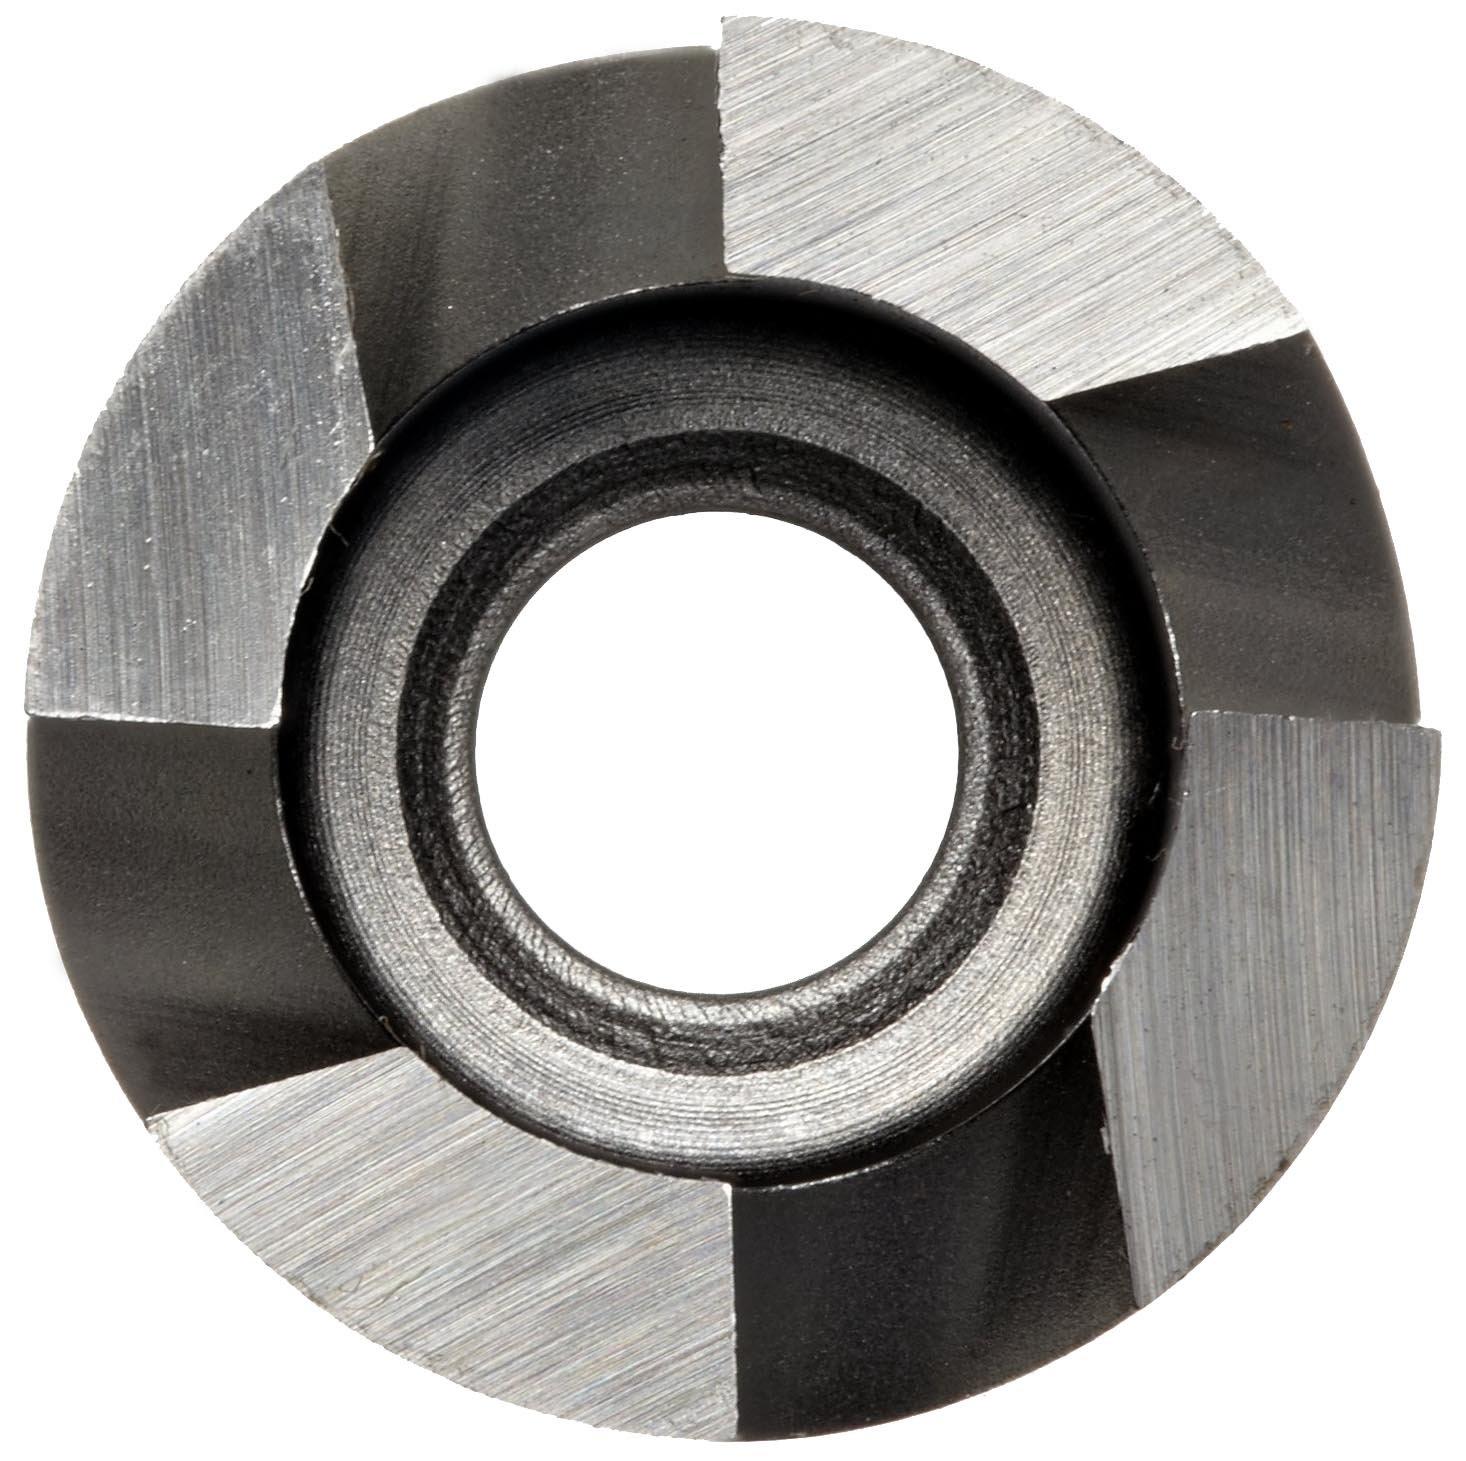 1//4 Depth Jancy Slugger High Speed Steel Sheet Metal Cutter 3//8 Annular Shank Bright Uncoated Finish 23//32 Diameter